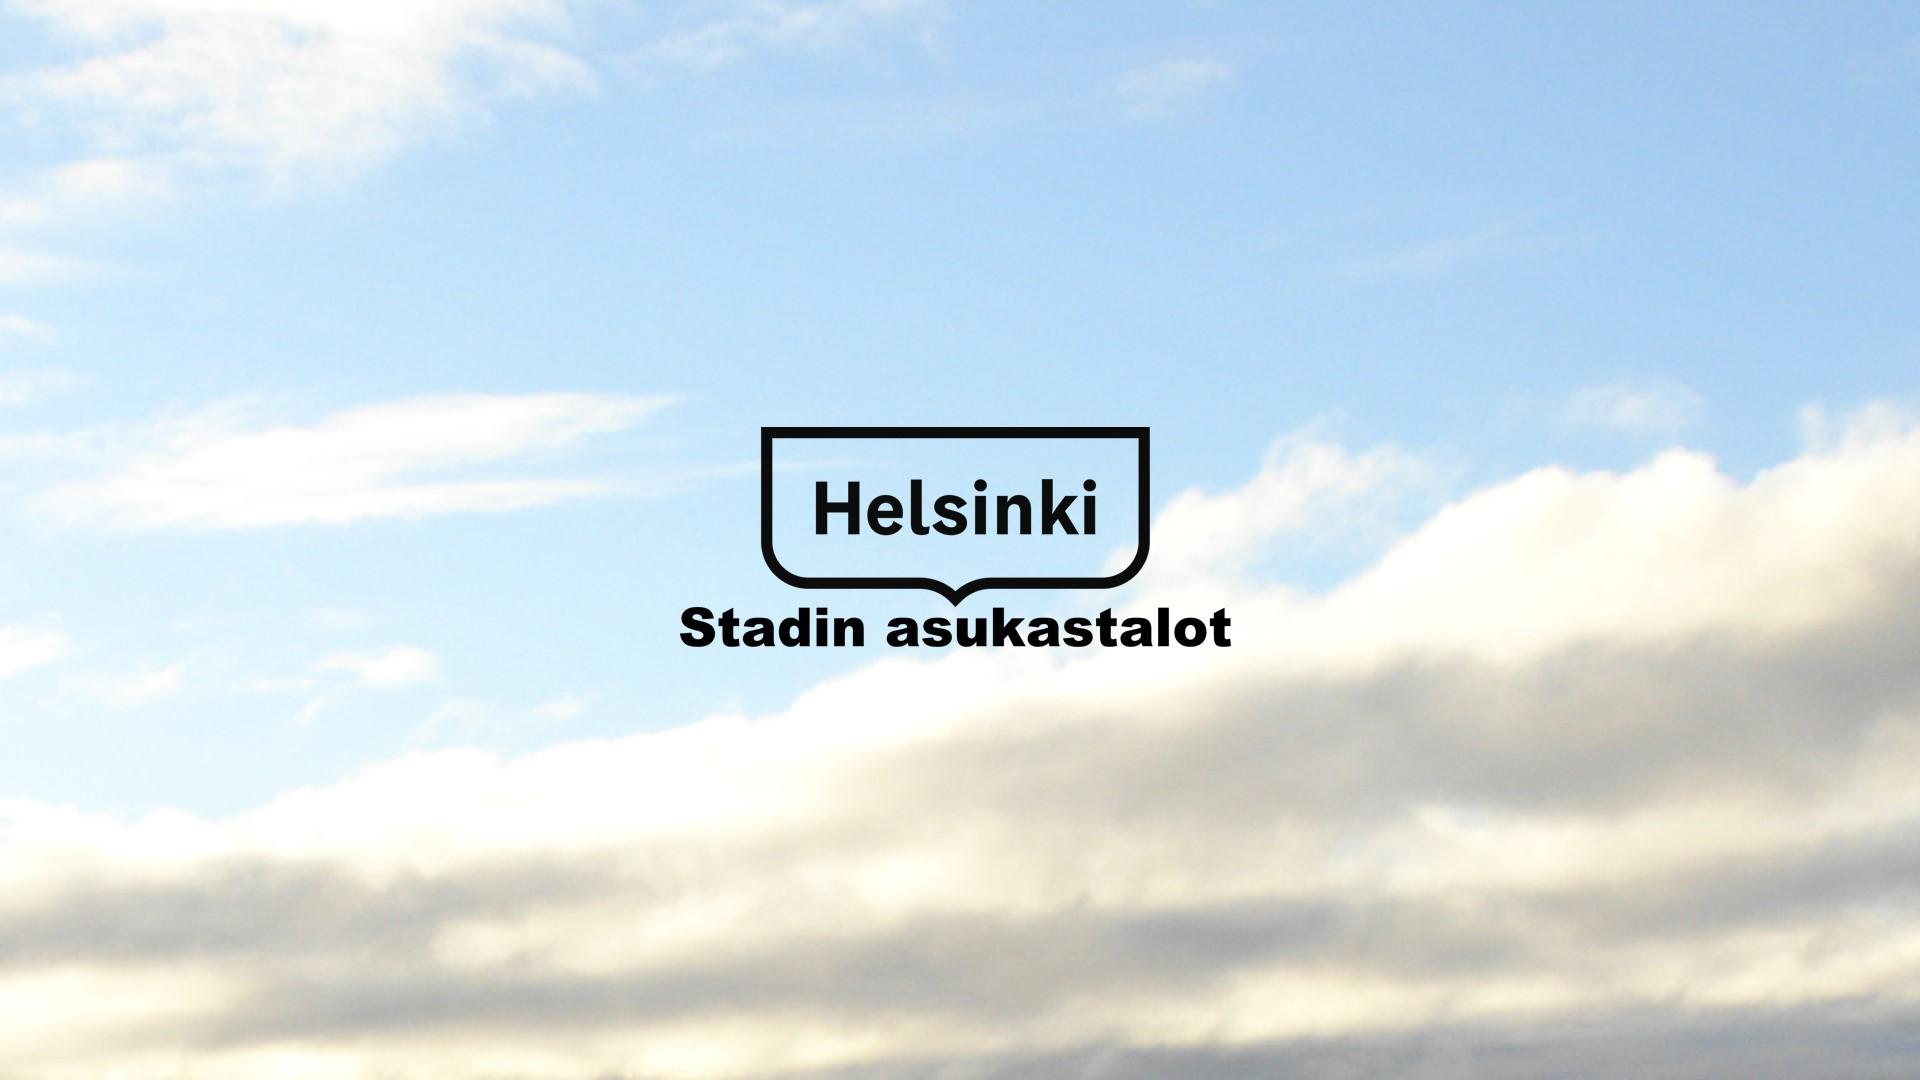 Link to event Luontoretki Mustikkamaalle 17.8 klo 11